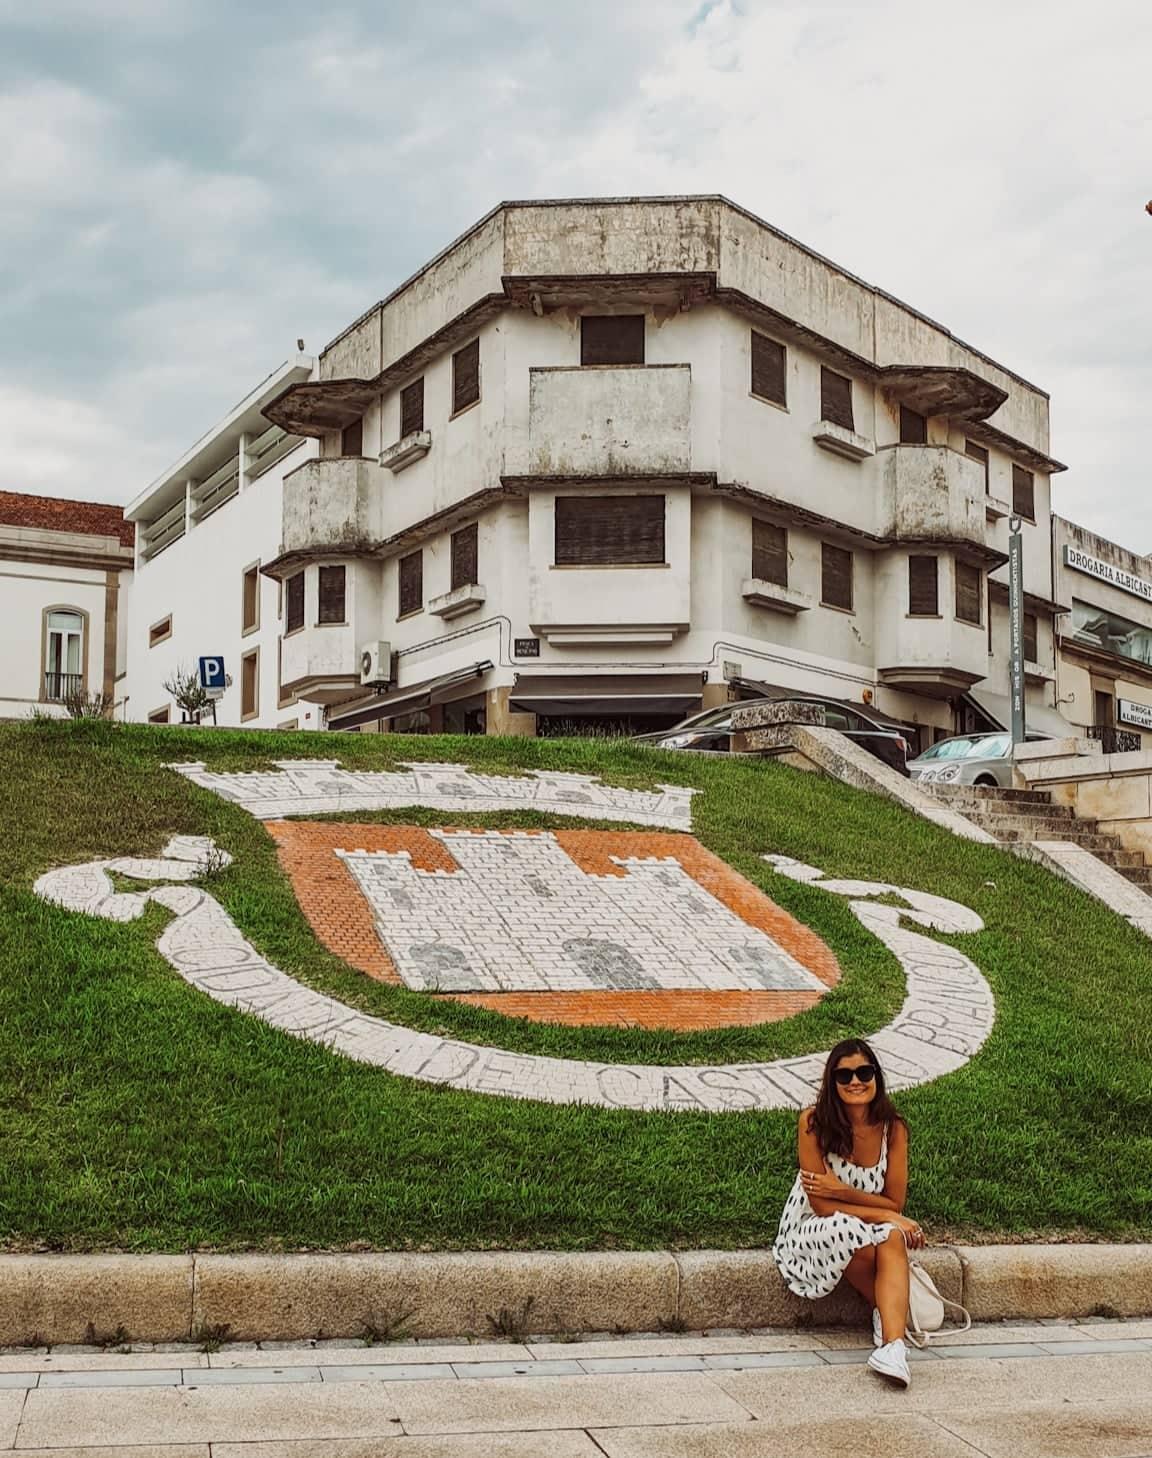 Visitar Castelo Branco: pelas cidades da Beira Baixa!